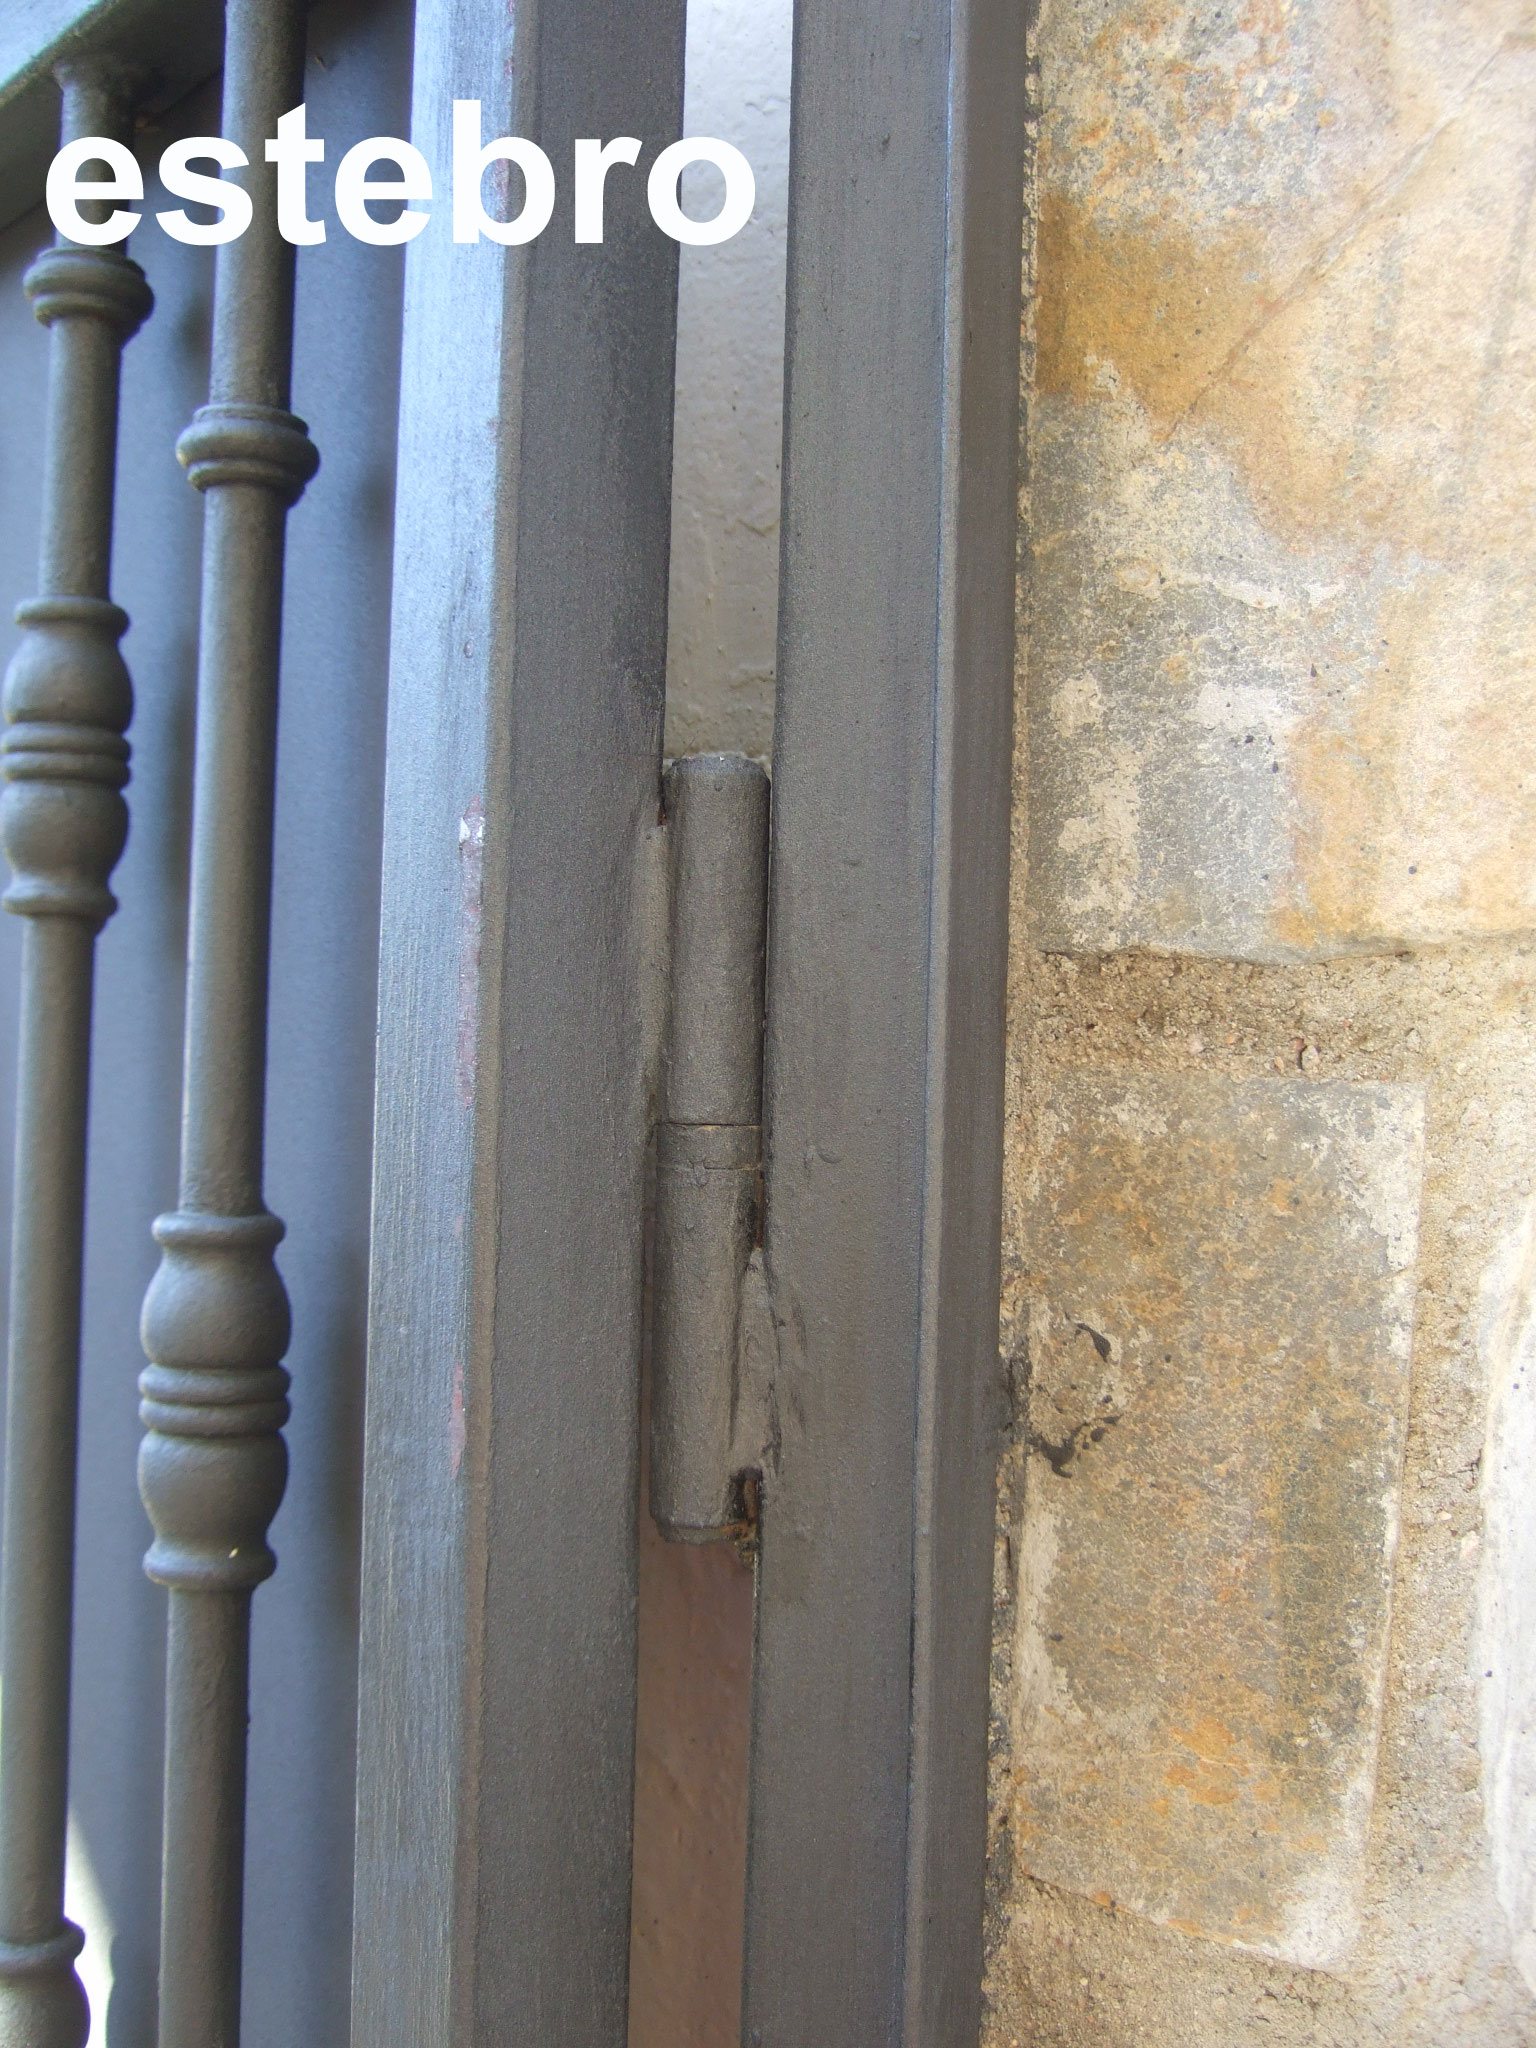 Bisagras soldar herrajes puertas - Tipos de bisagras para puertas ...